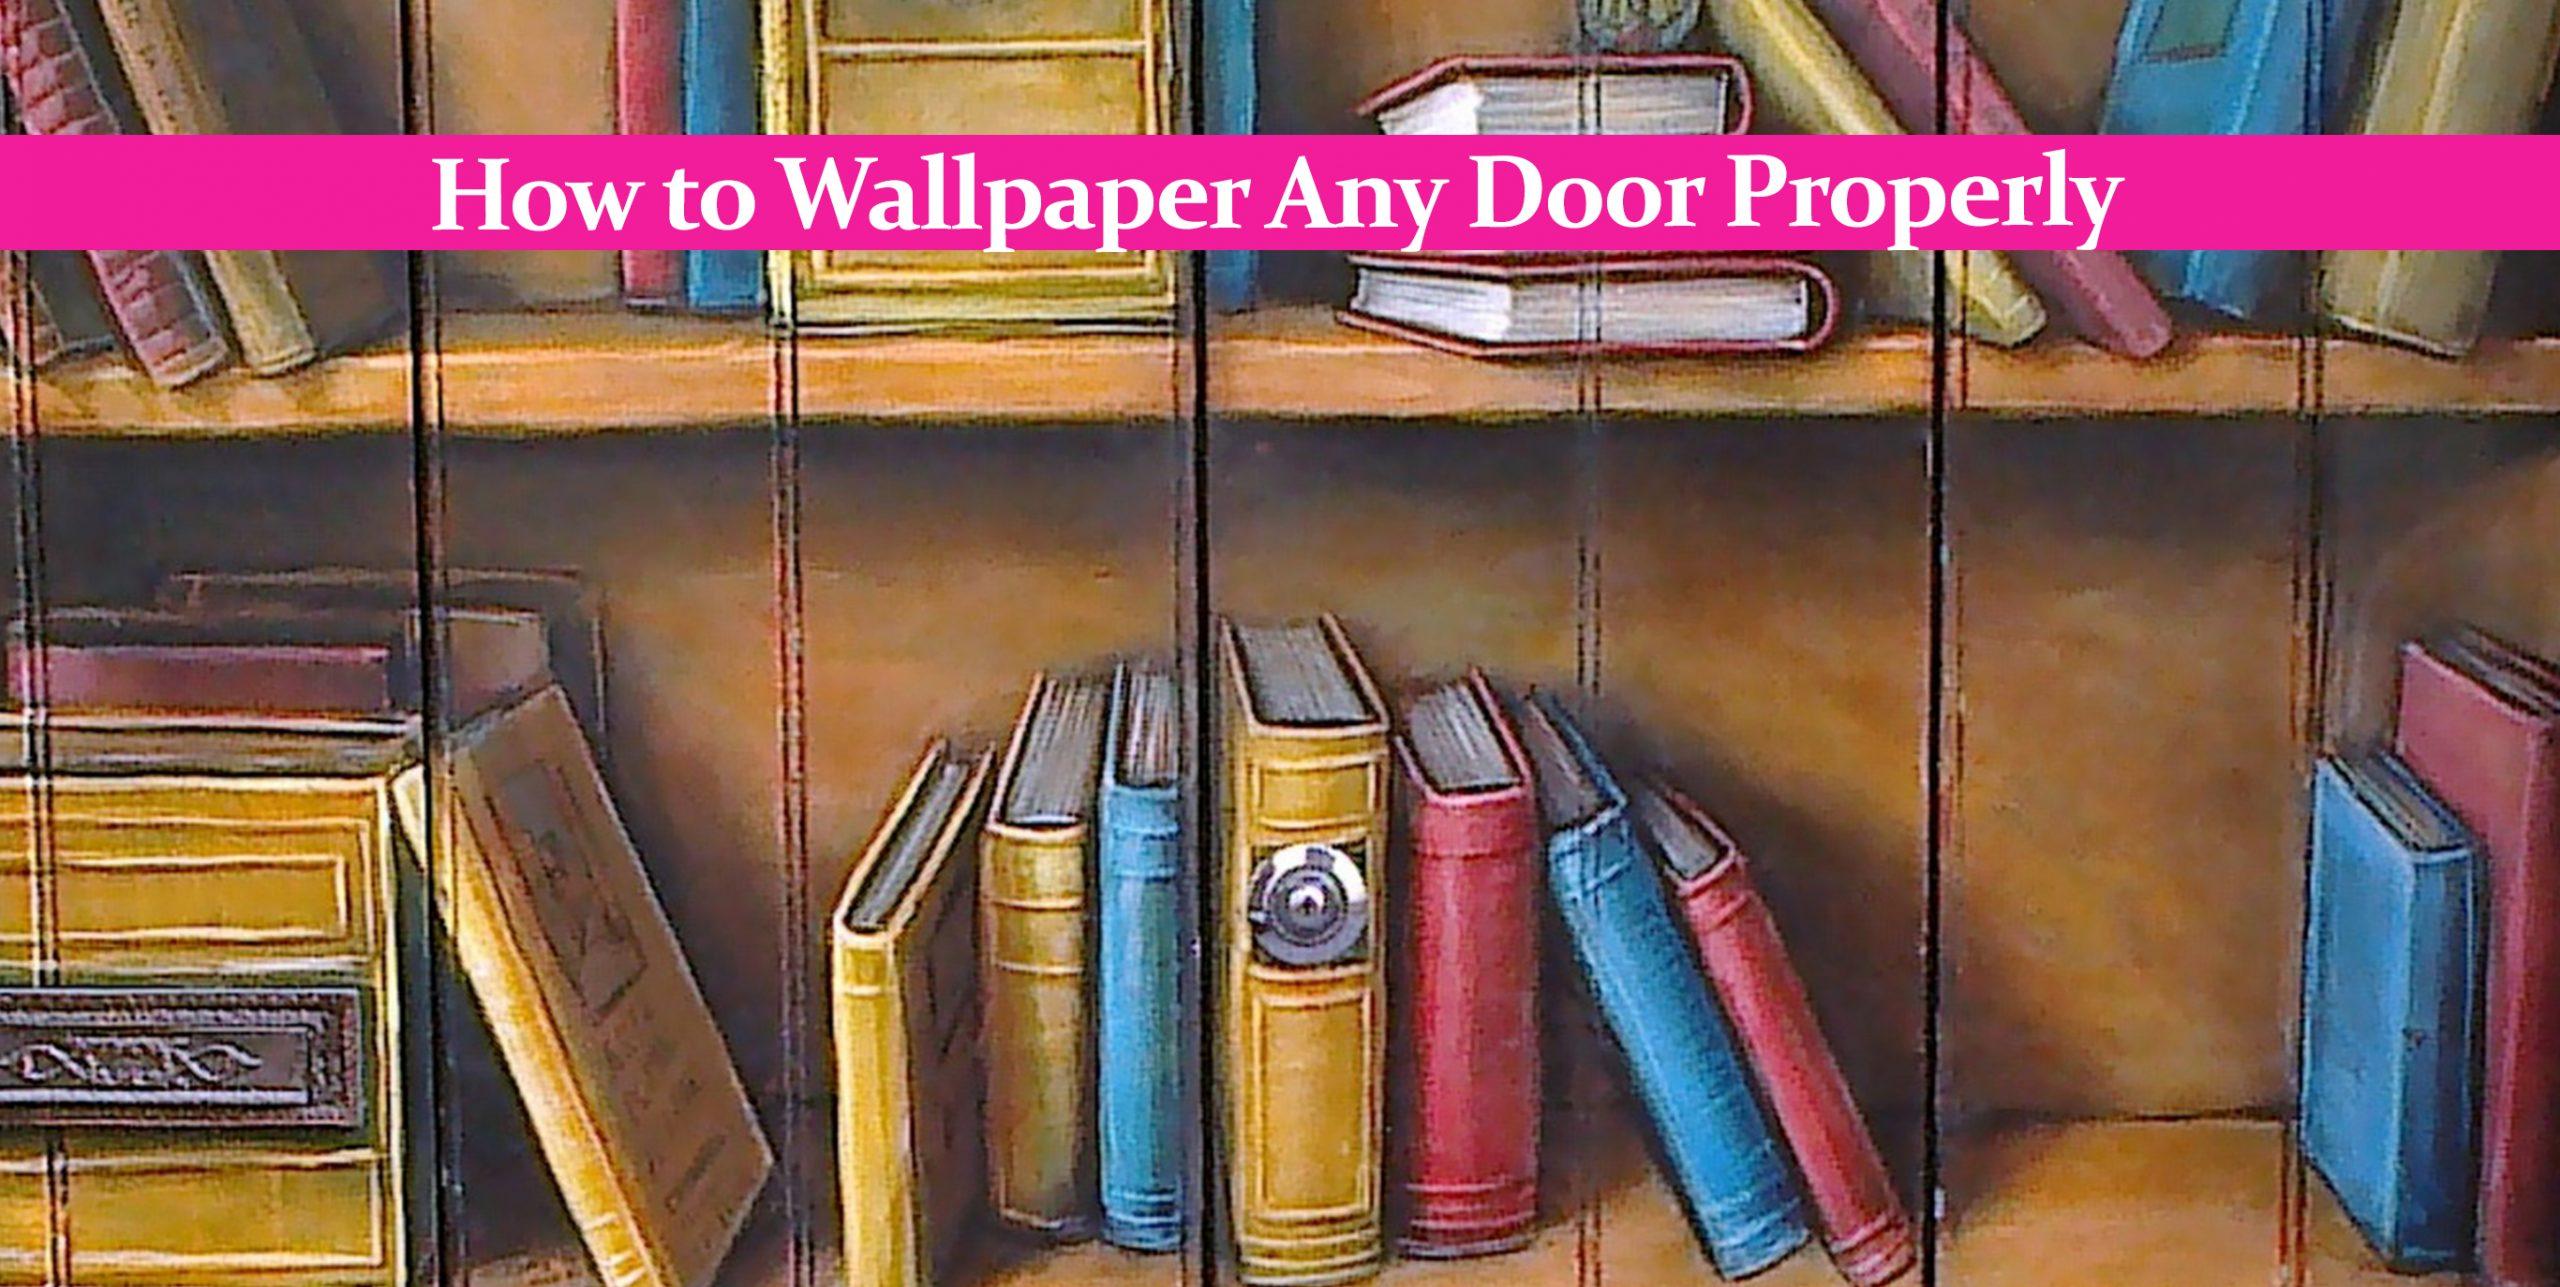 How to Wallpaper Any Door Properly